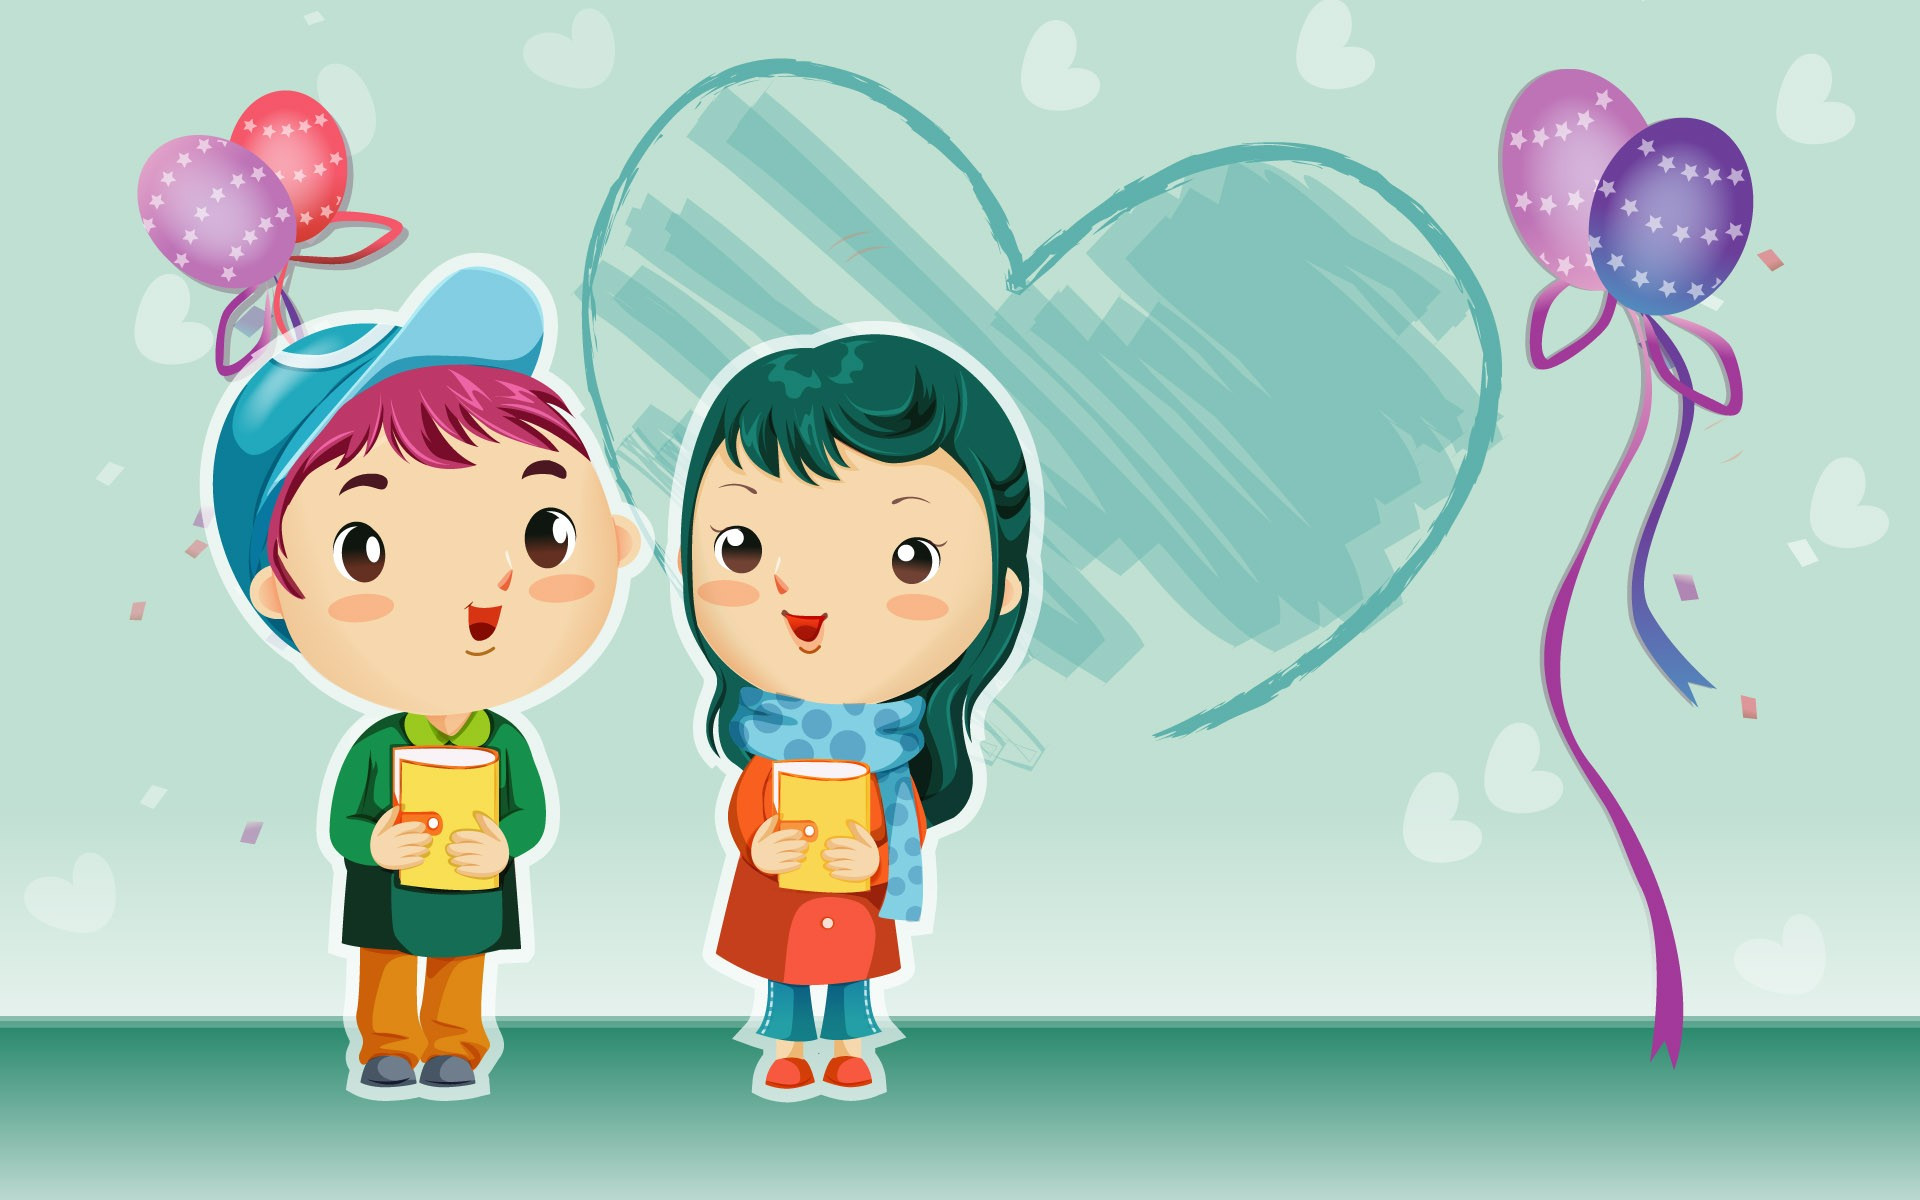 Cute Cartoon Couple Cartoon Image Full Hd 1920x1200 Wallpaper Teahub Io